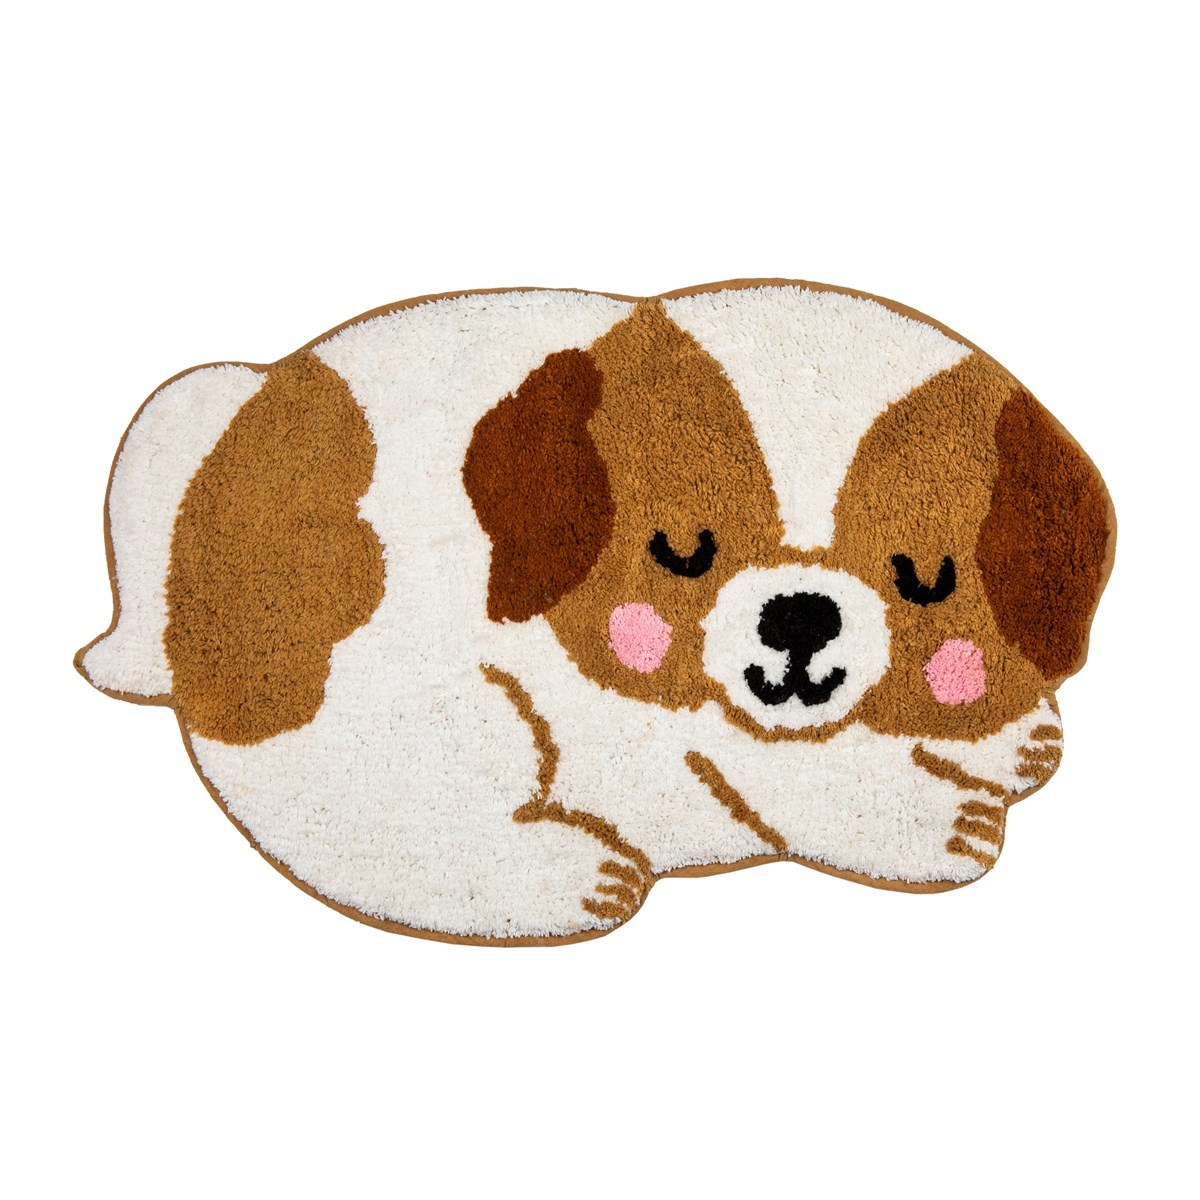 Puppy Dog Playtime Rug